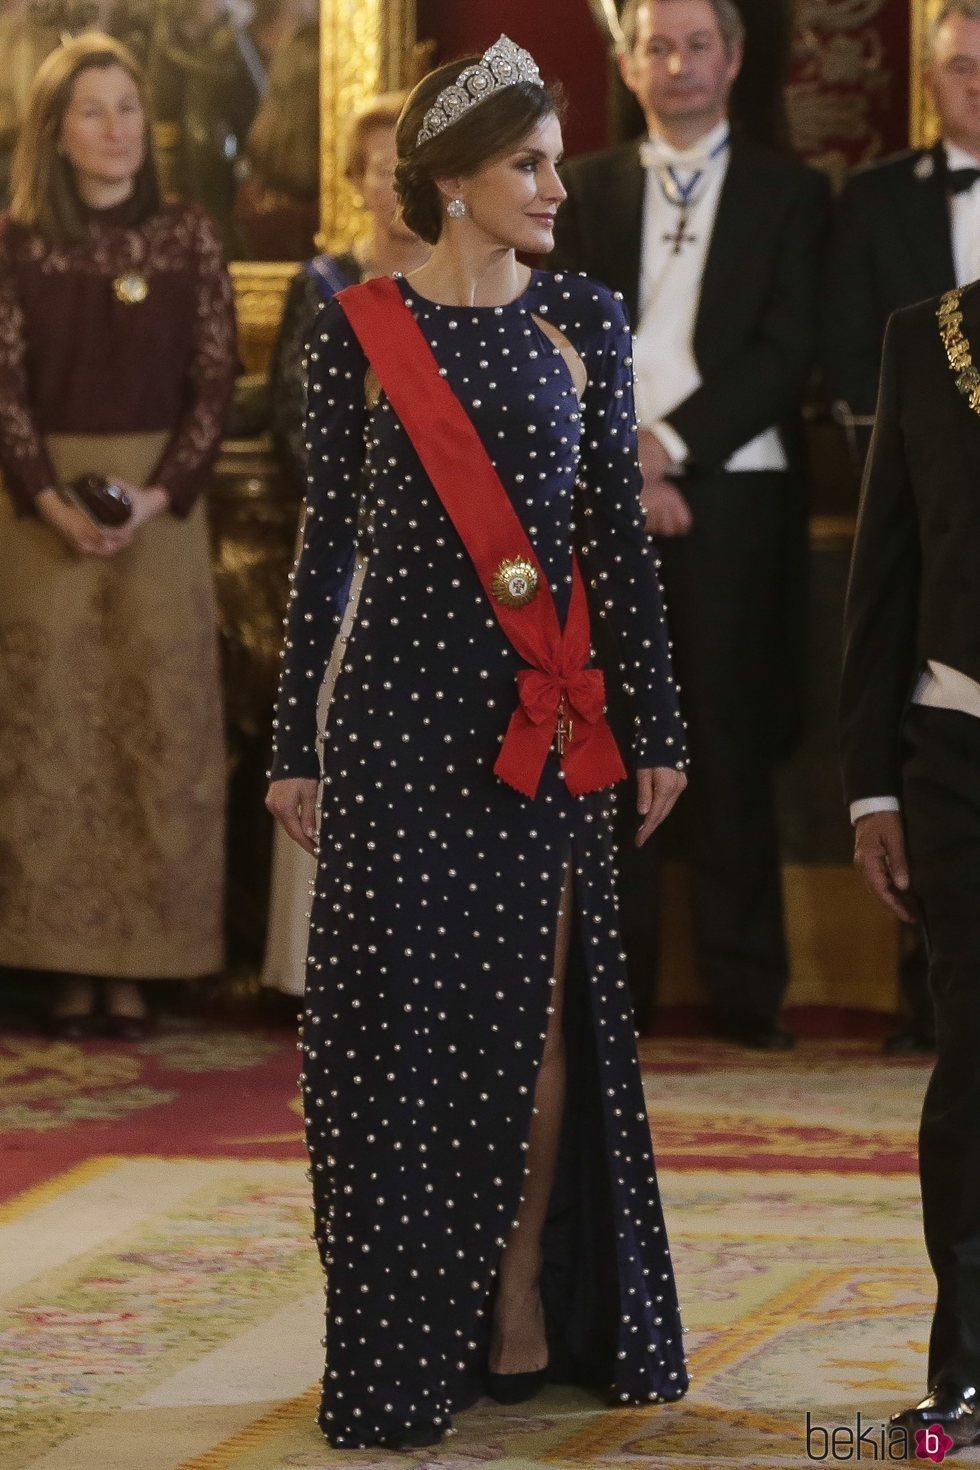 La Reina Letizia vestida de Ana Locking en la cena de gala en honor al presidente de Portugal